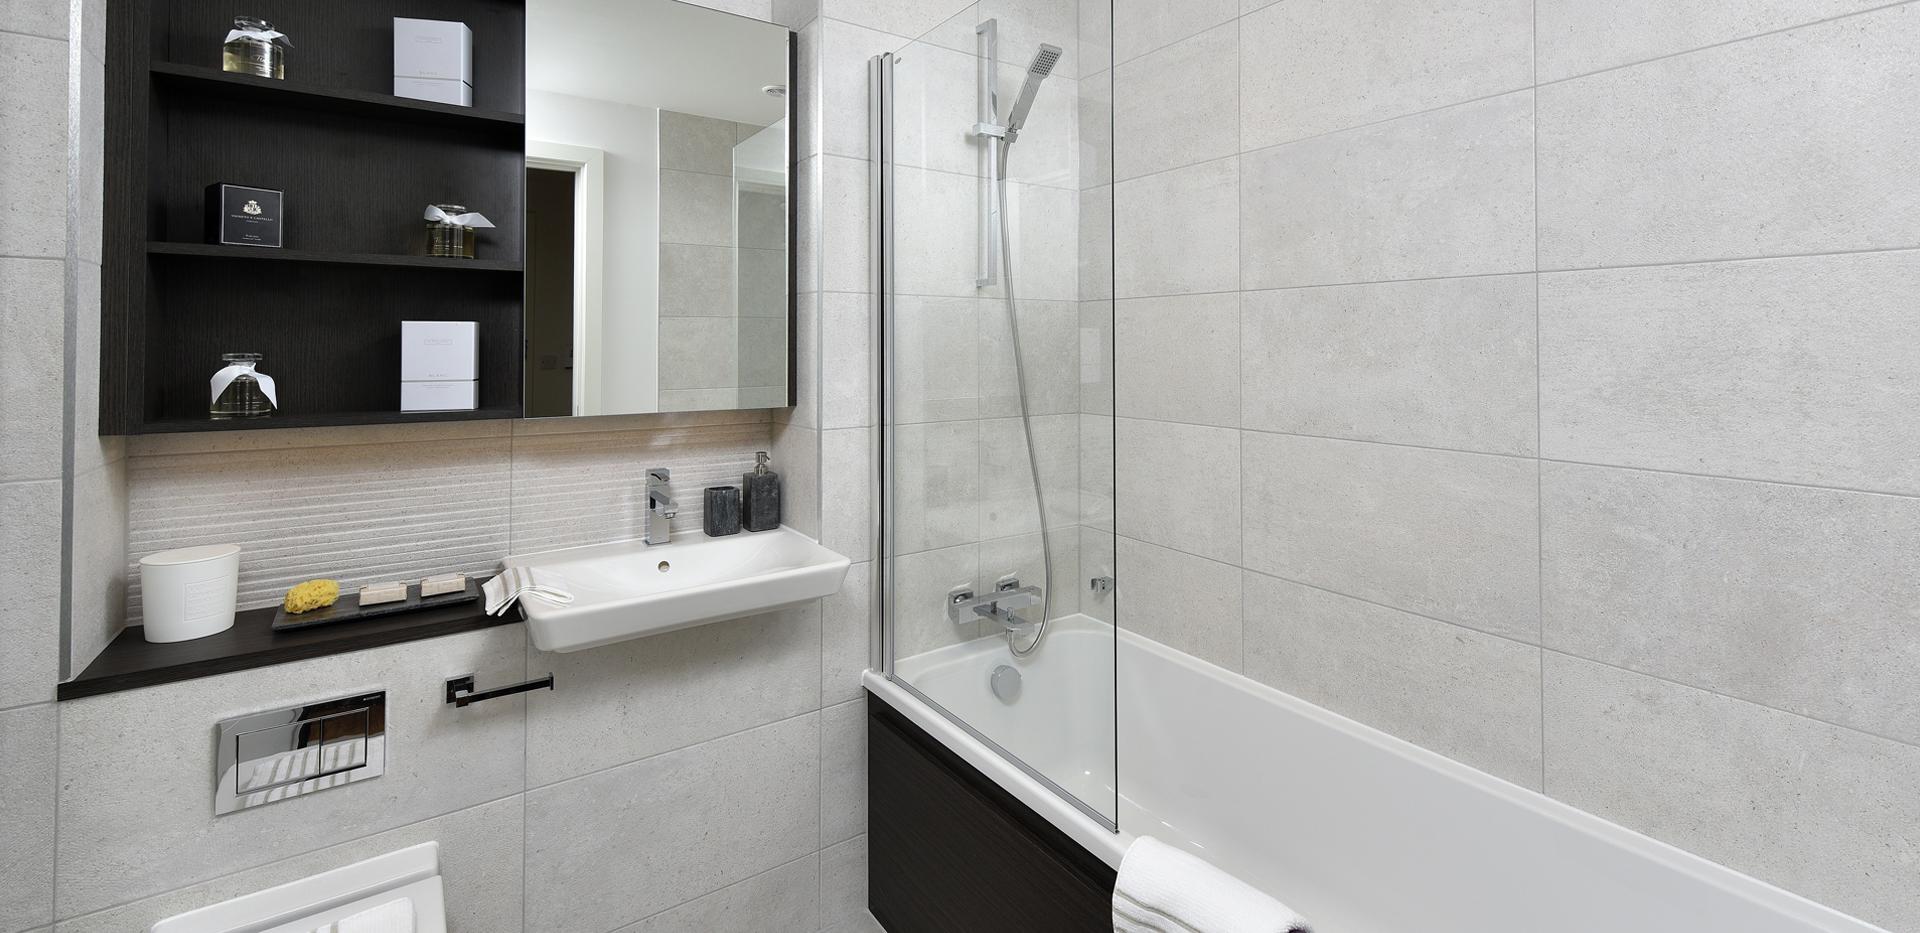 Berkeley, Brunswick Square, Interior, Bathroom